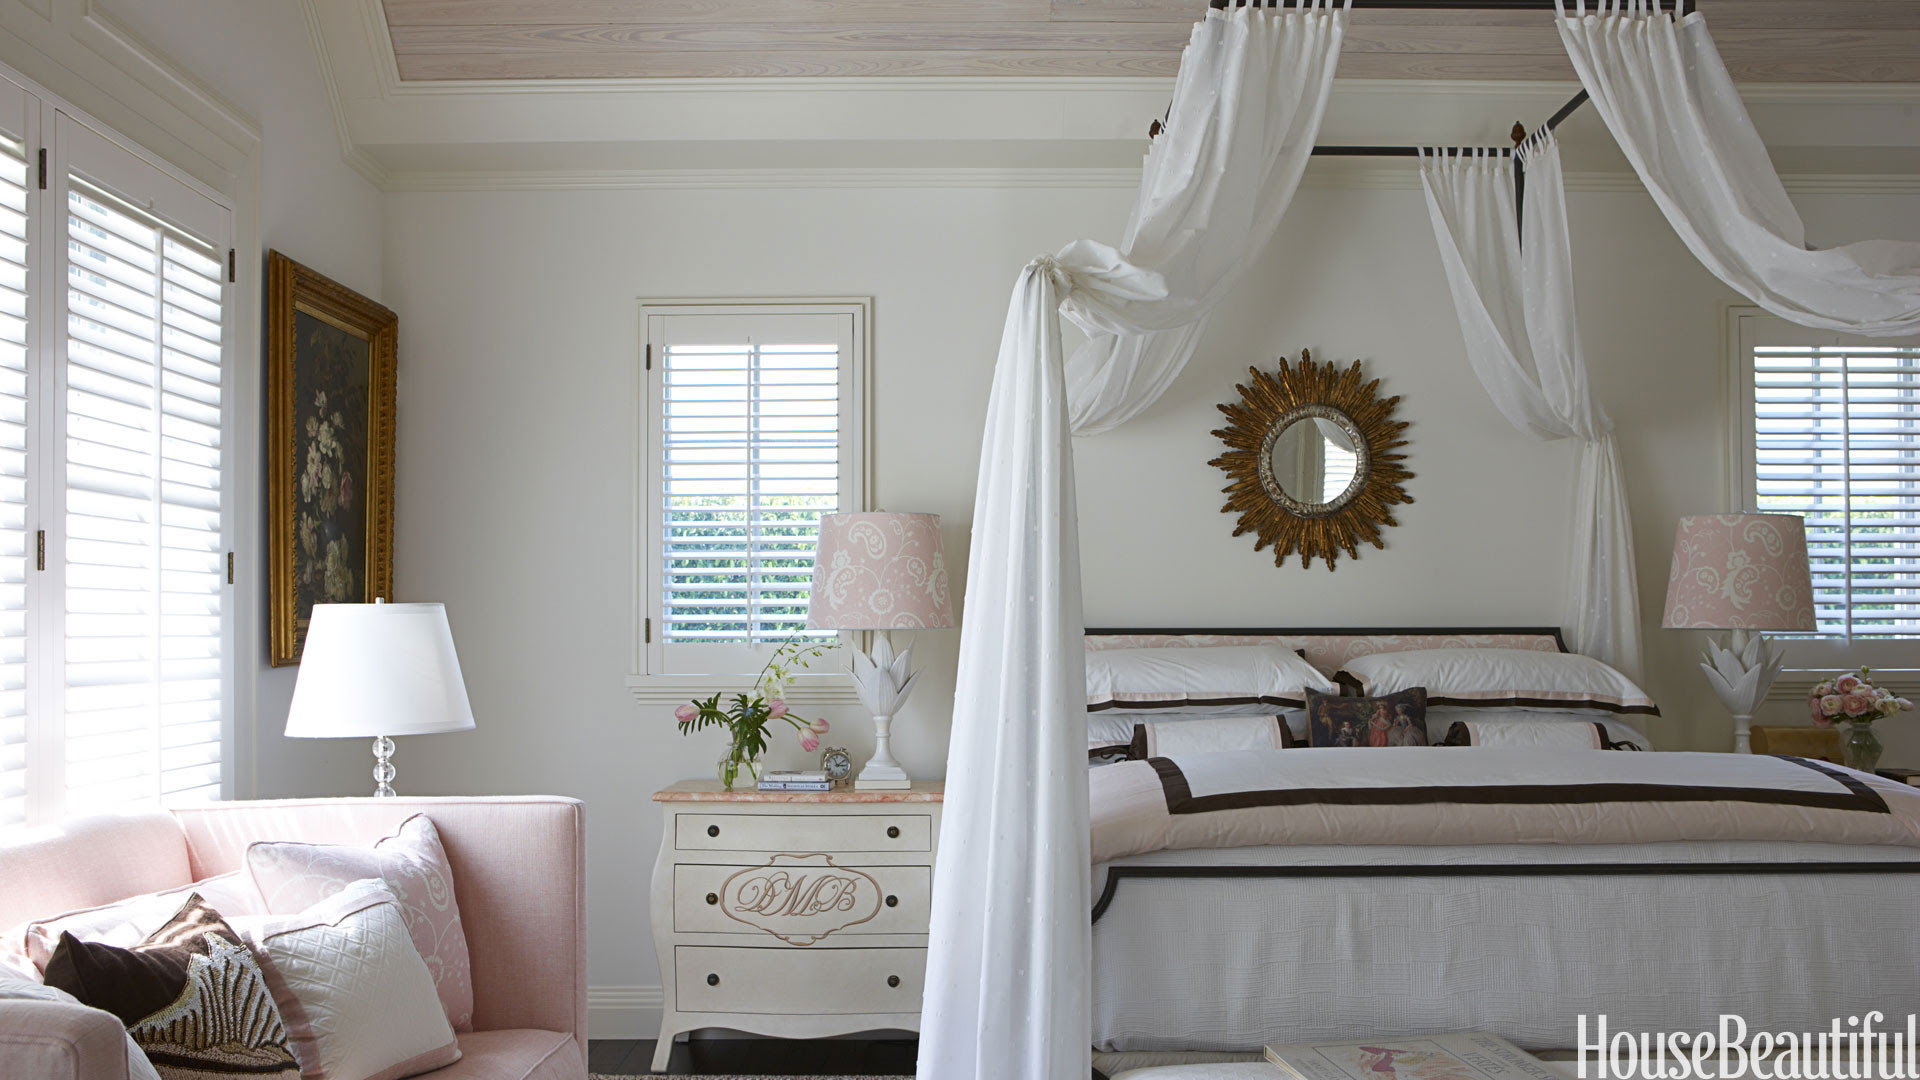 12 Romantic Bedrooms - Ideas for Sexy Bedroom Decor